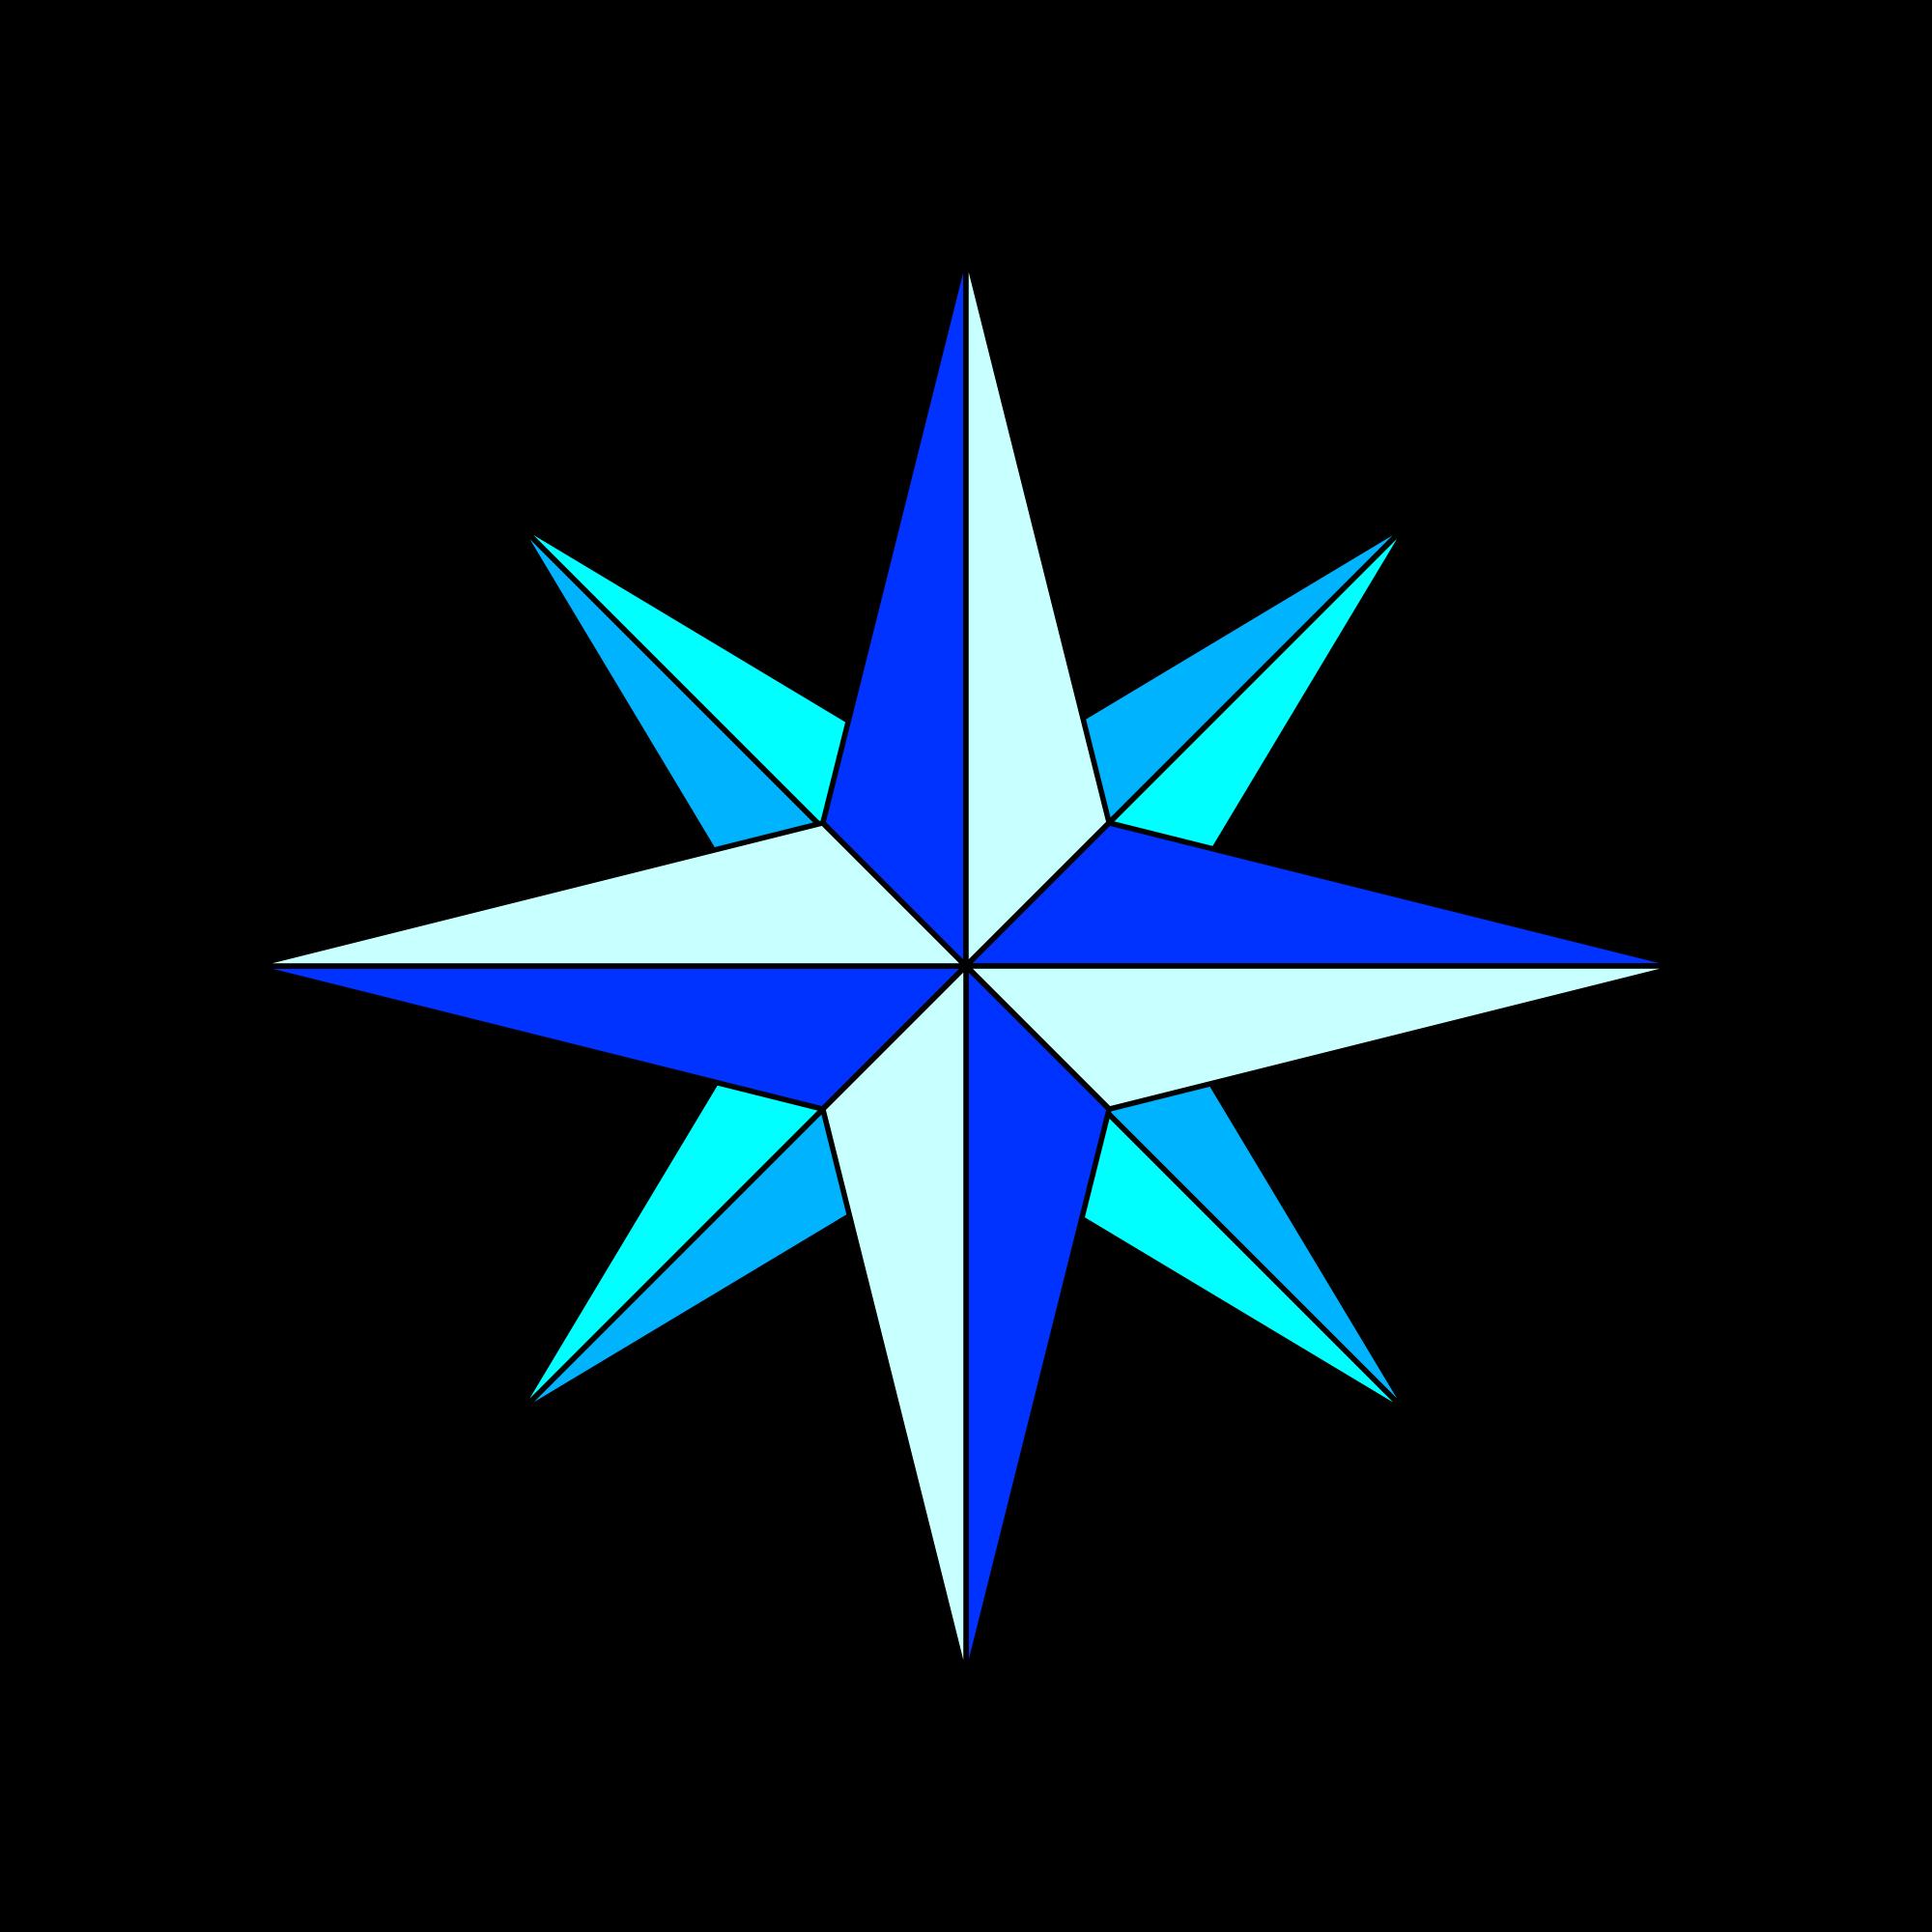 Compass desktop backgrounds filecompass. Clipart rose simple